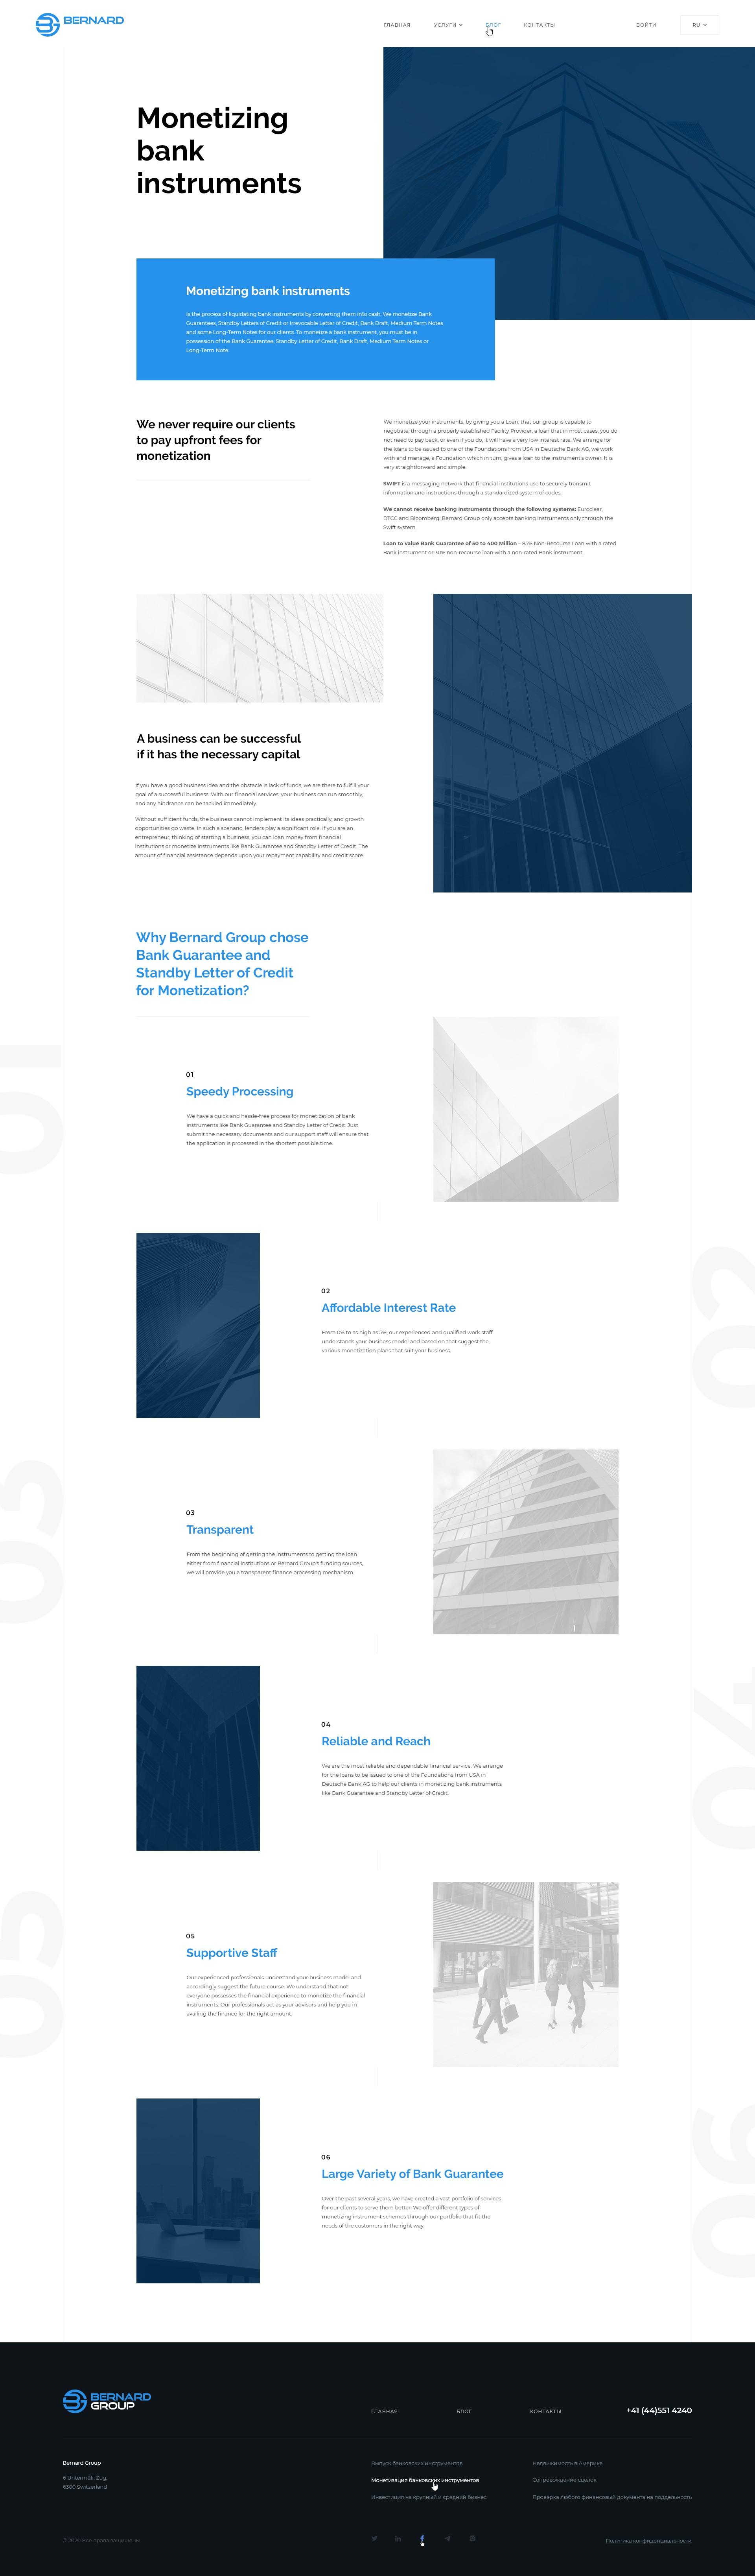 Bernard_Group_13_Product_page_1.0